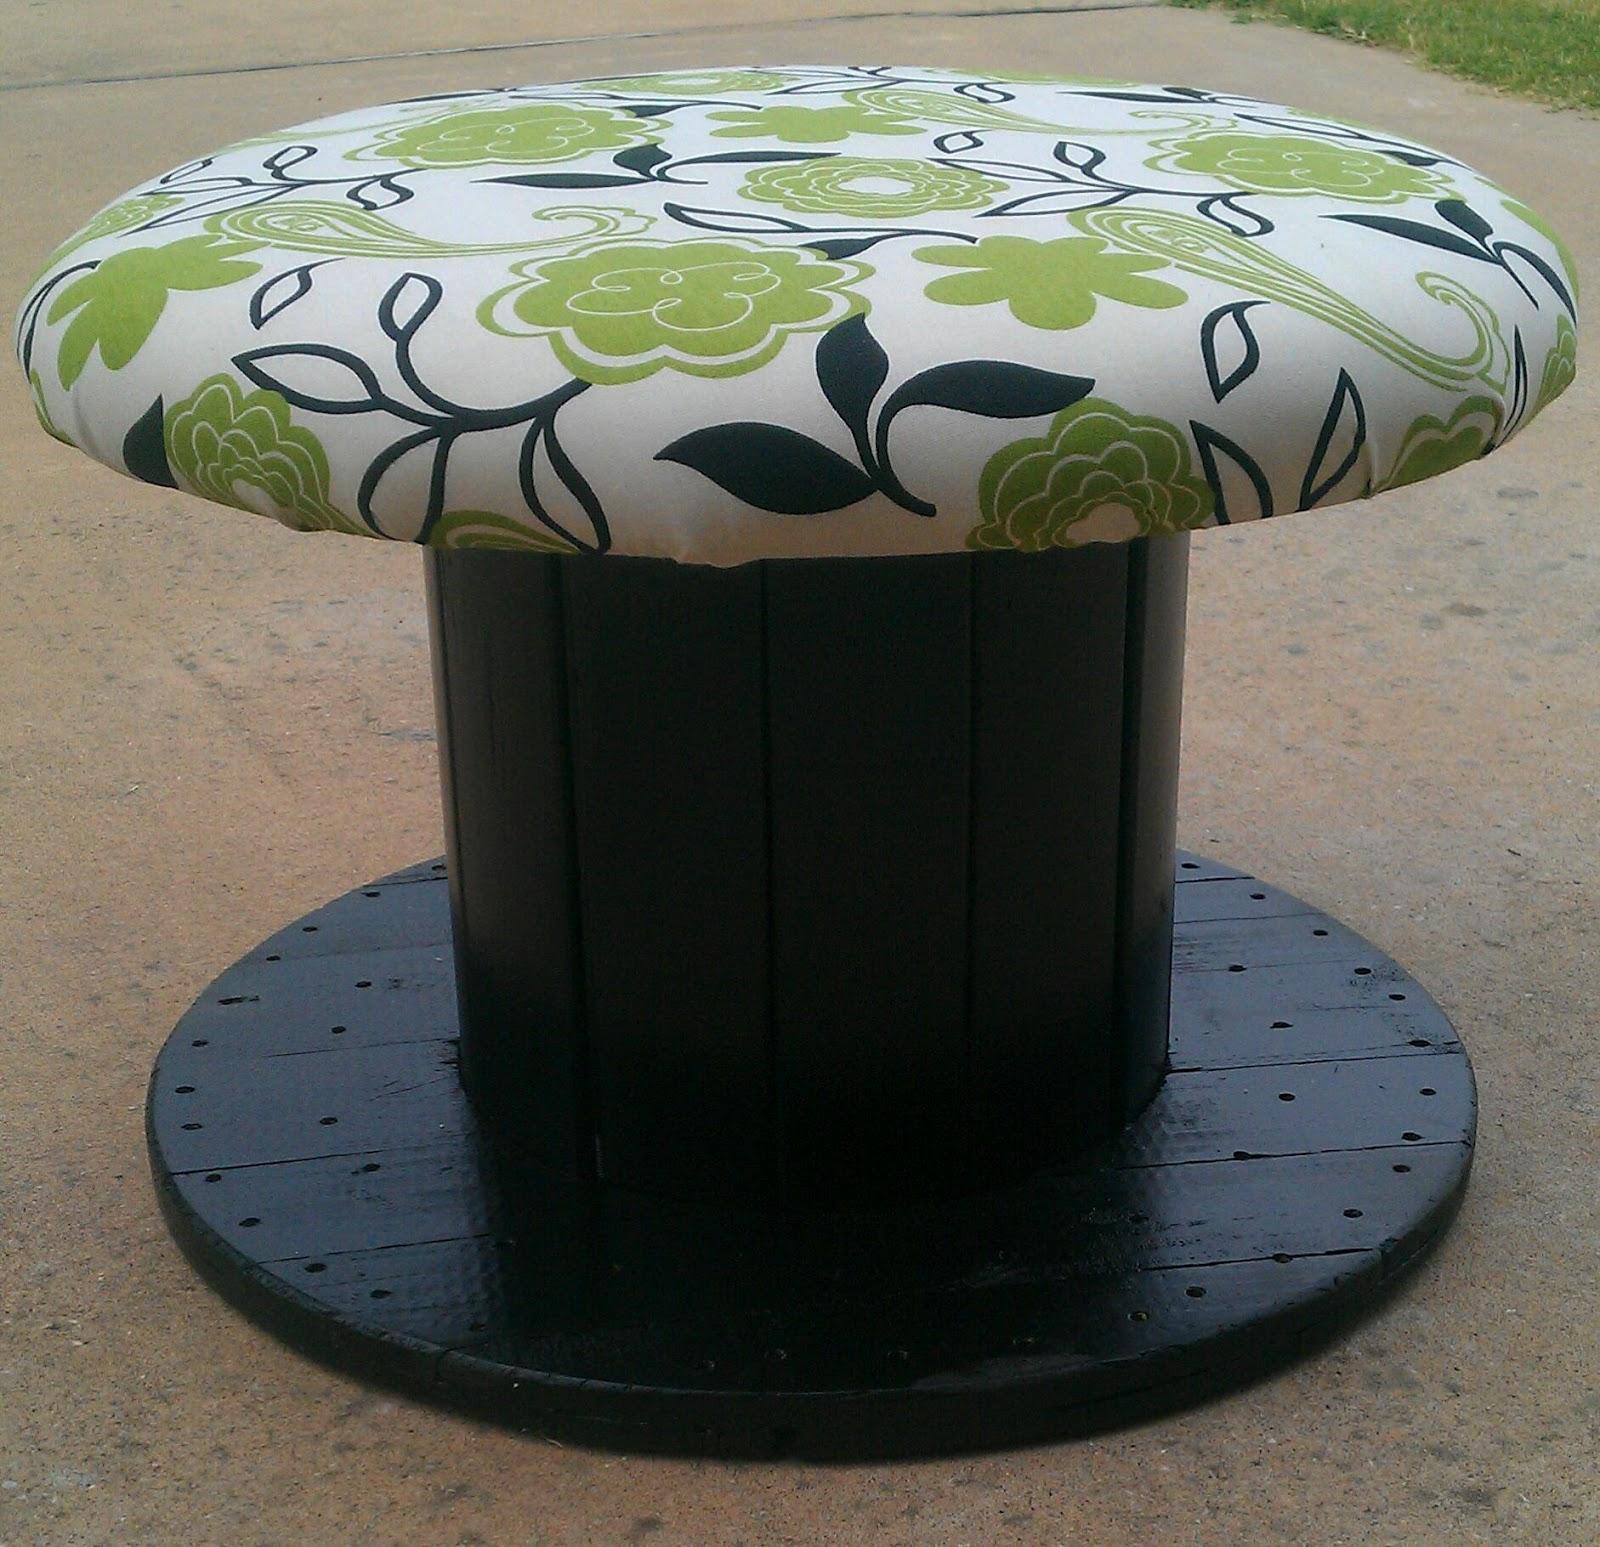 Moonruffle Giant Wooden Spool Chair